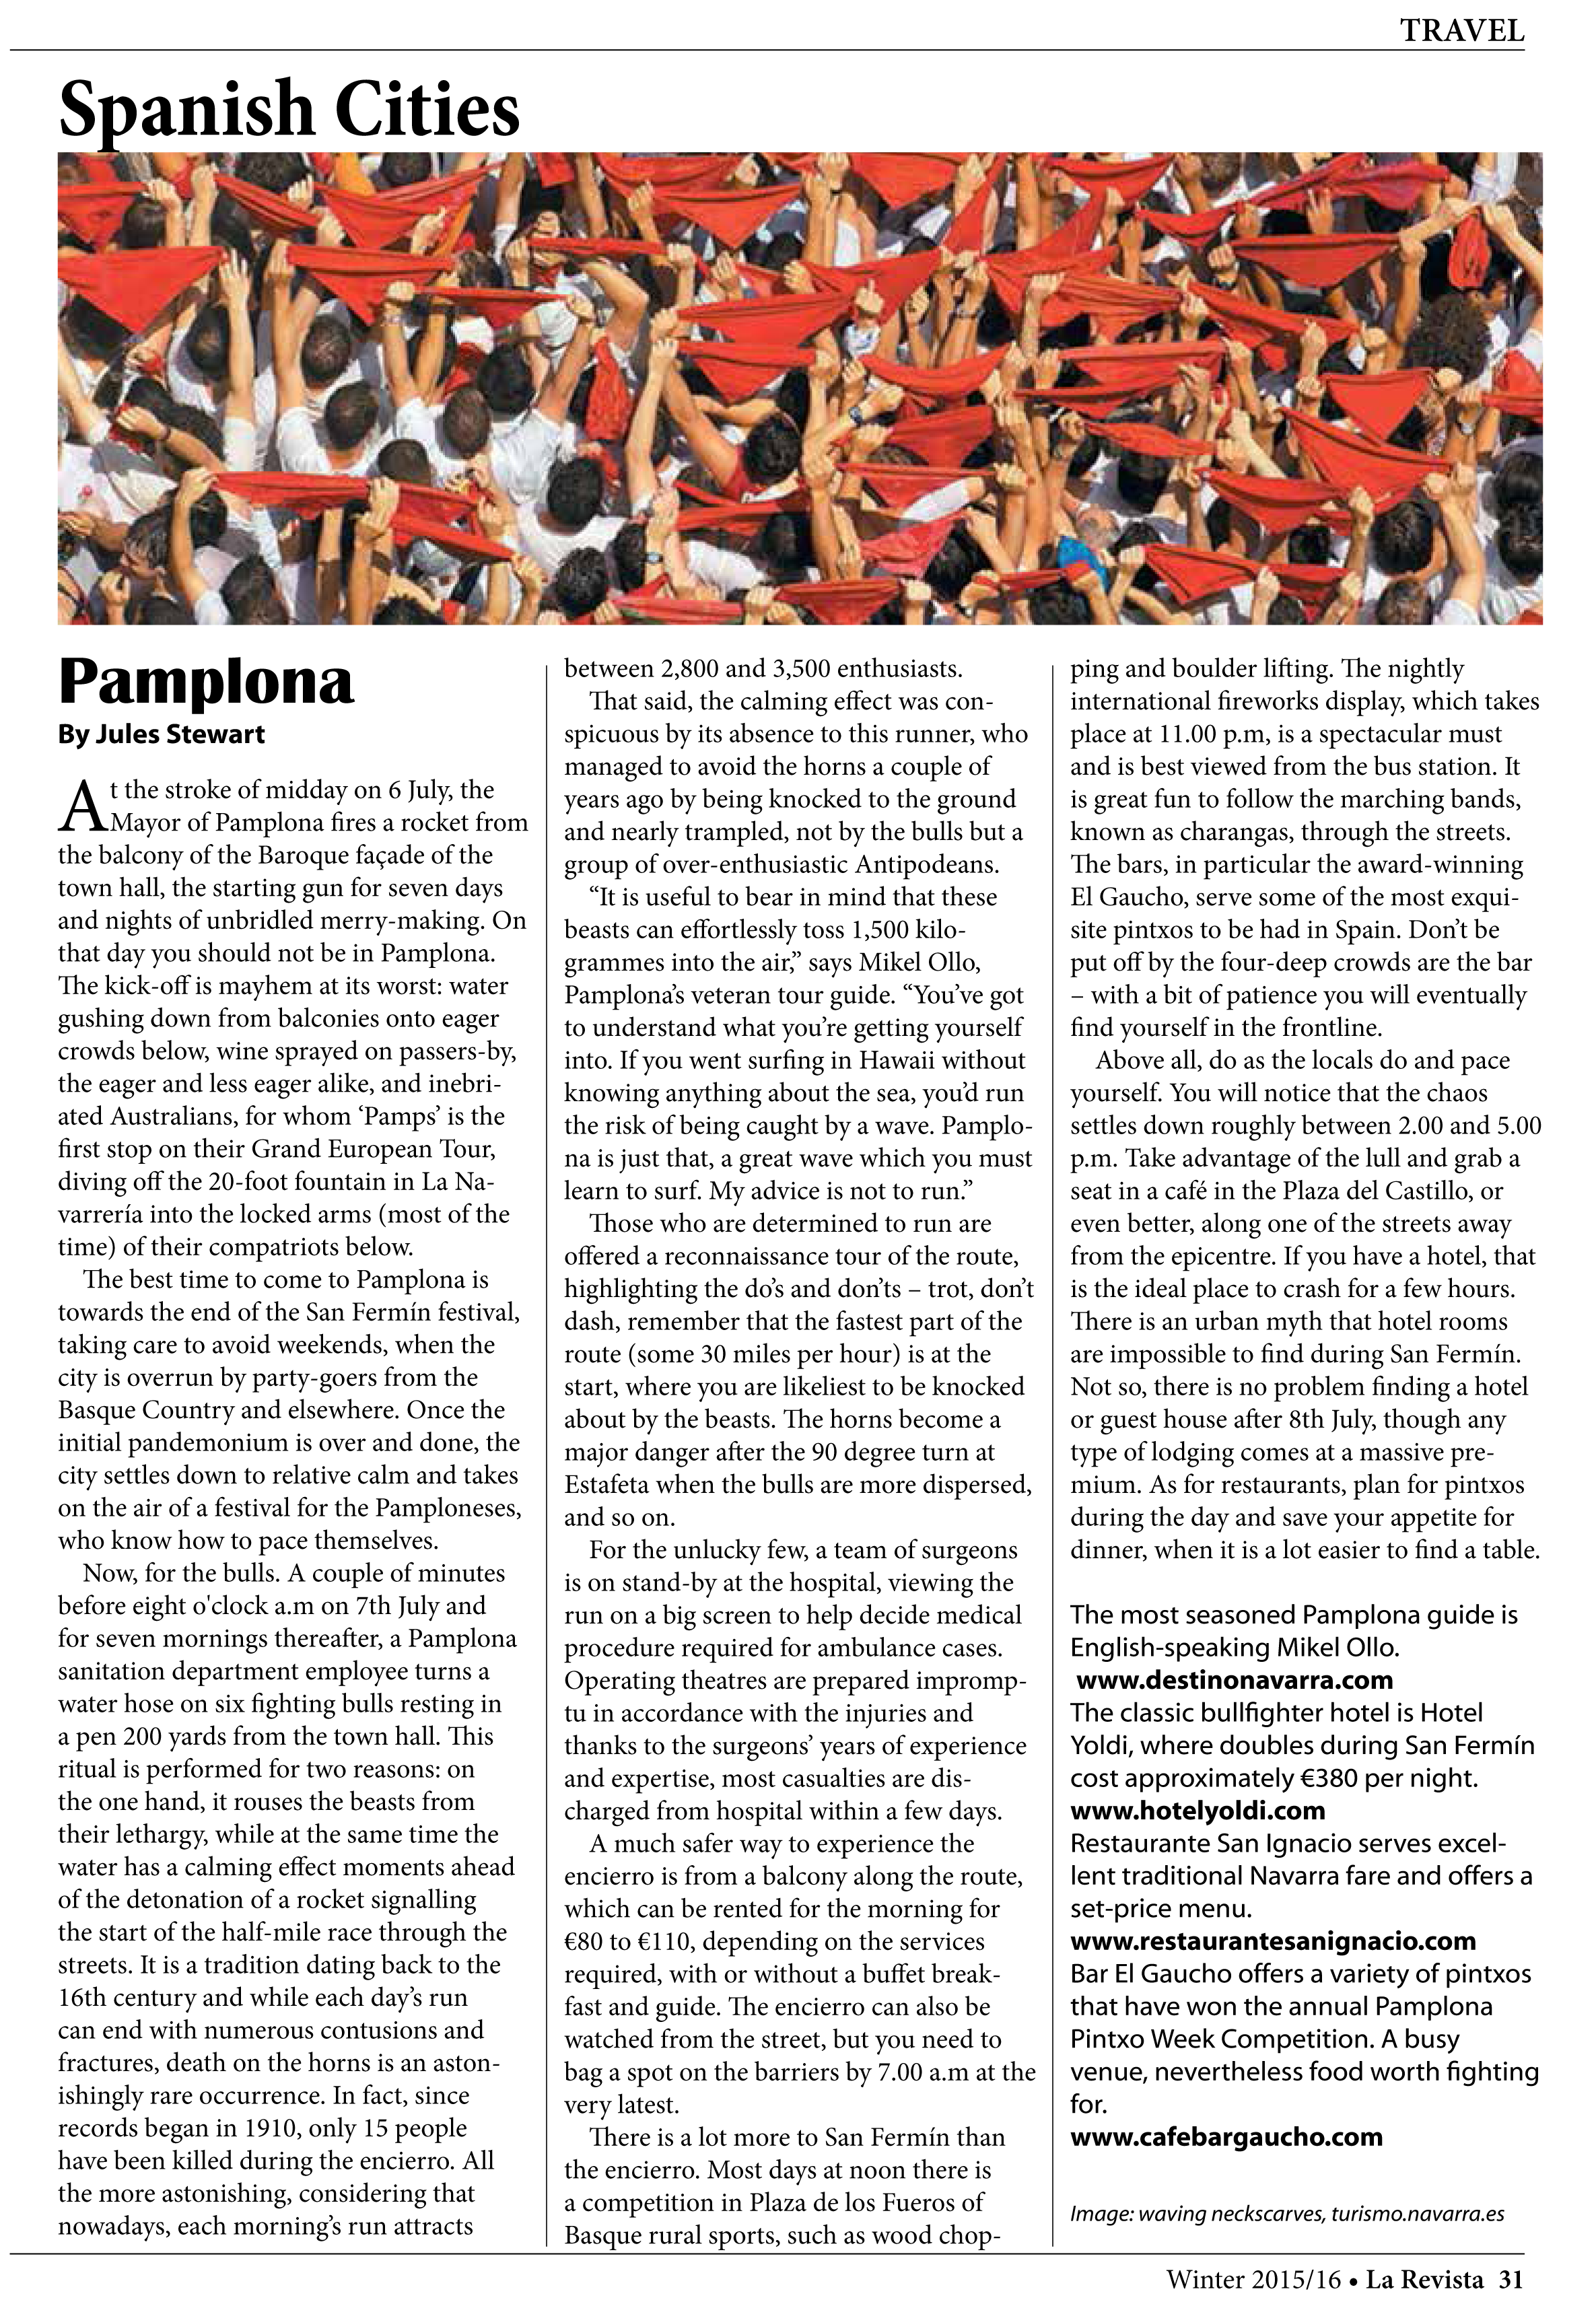 Pamplona, Jules Stewart. La Revista.. Bristish Spanish Society